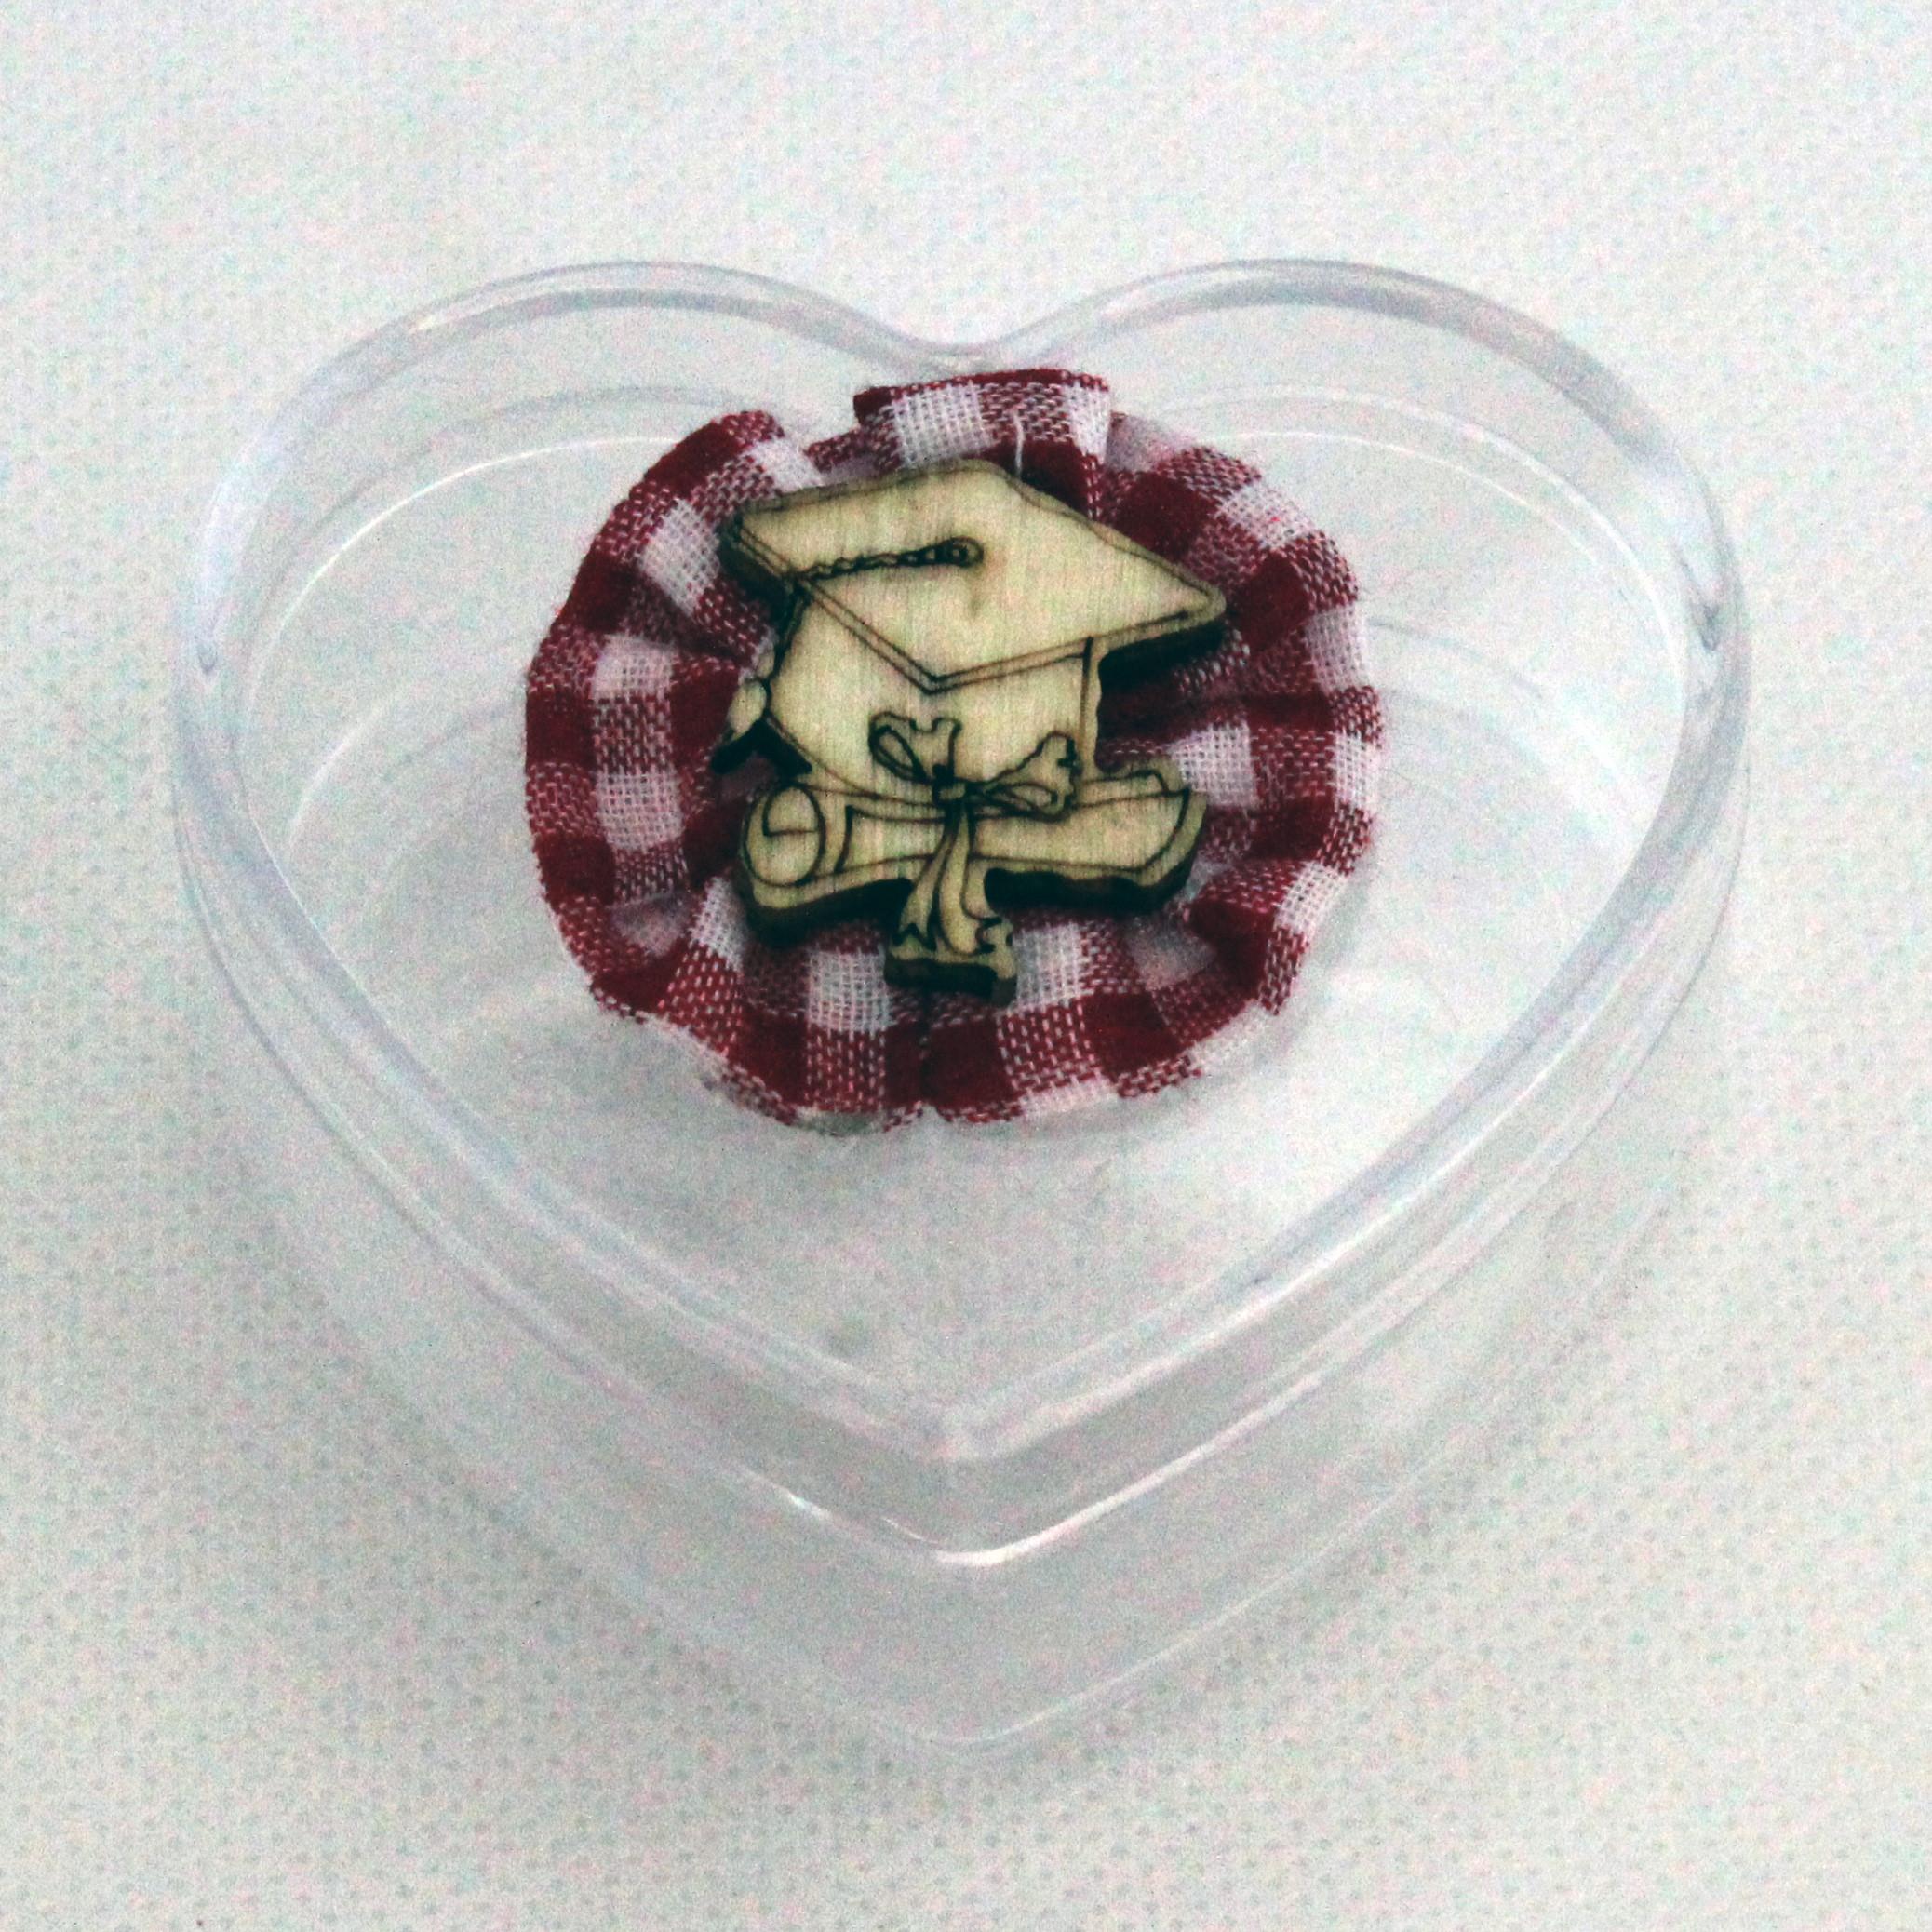 Scatolina cuore in plastica rigida rossa per laurea (kit 24 pezzi)